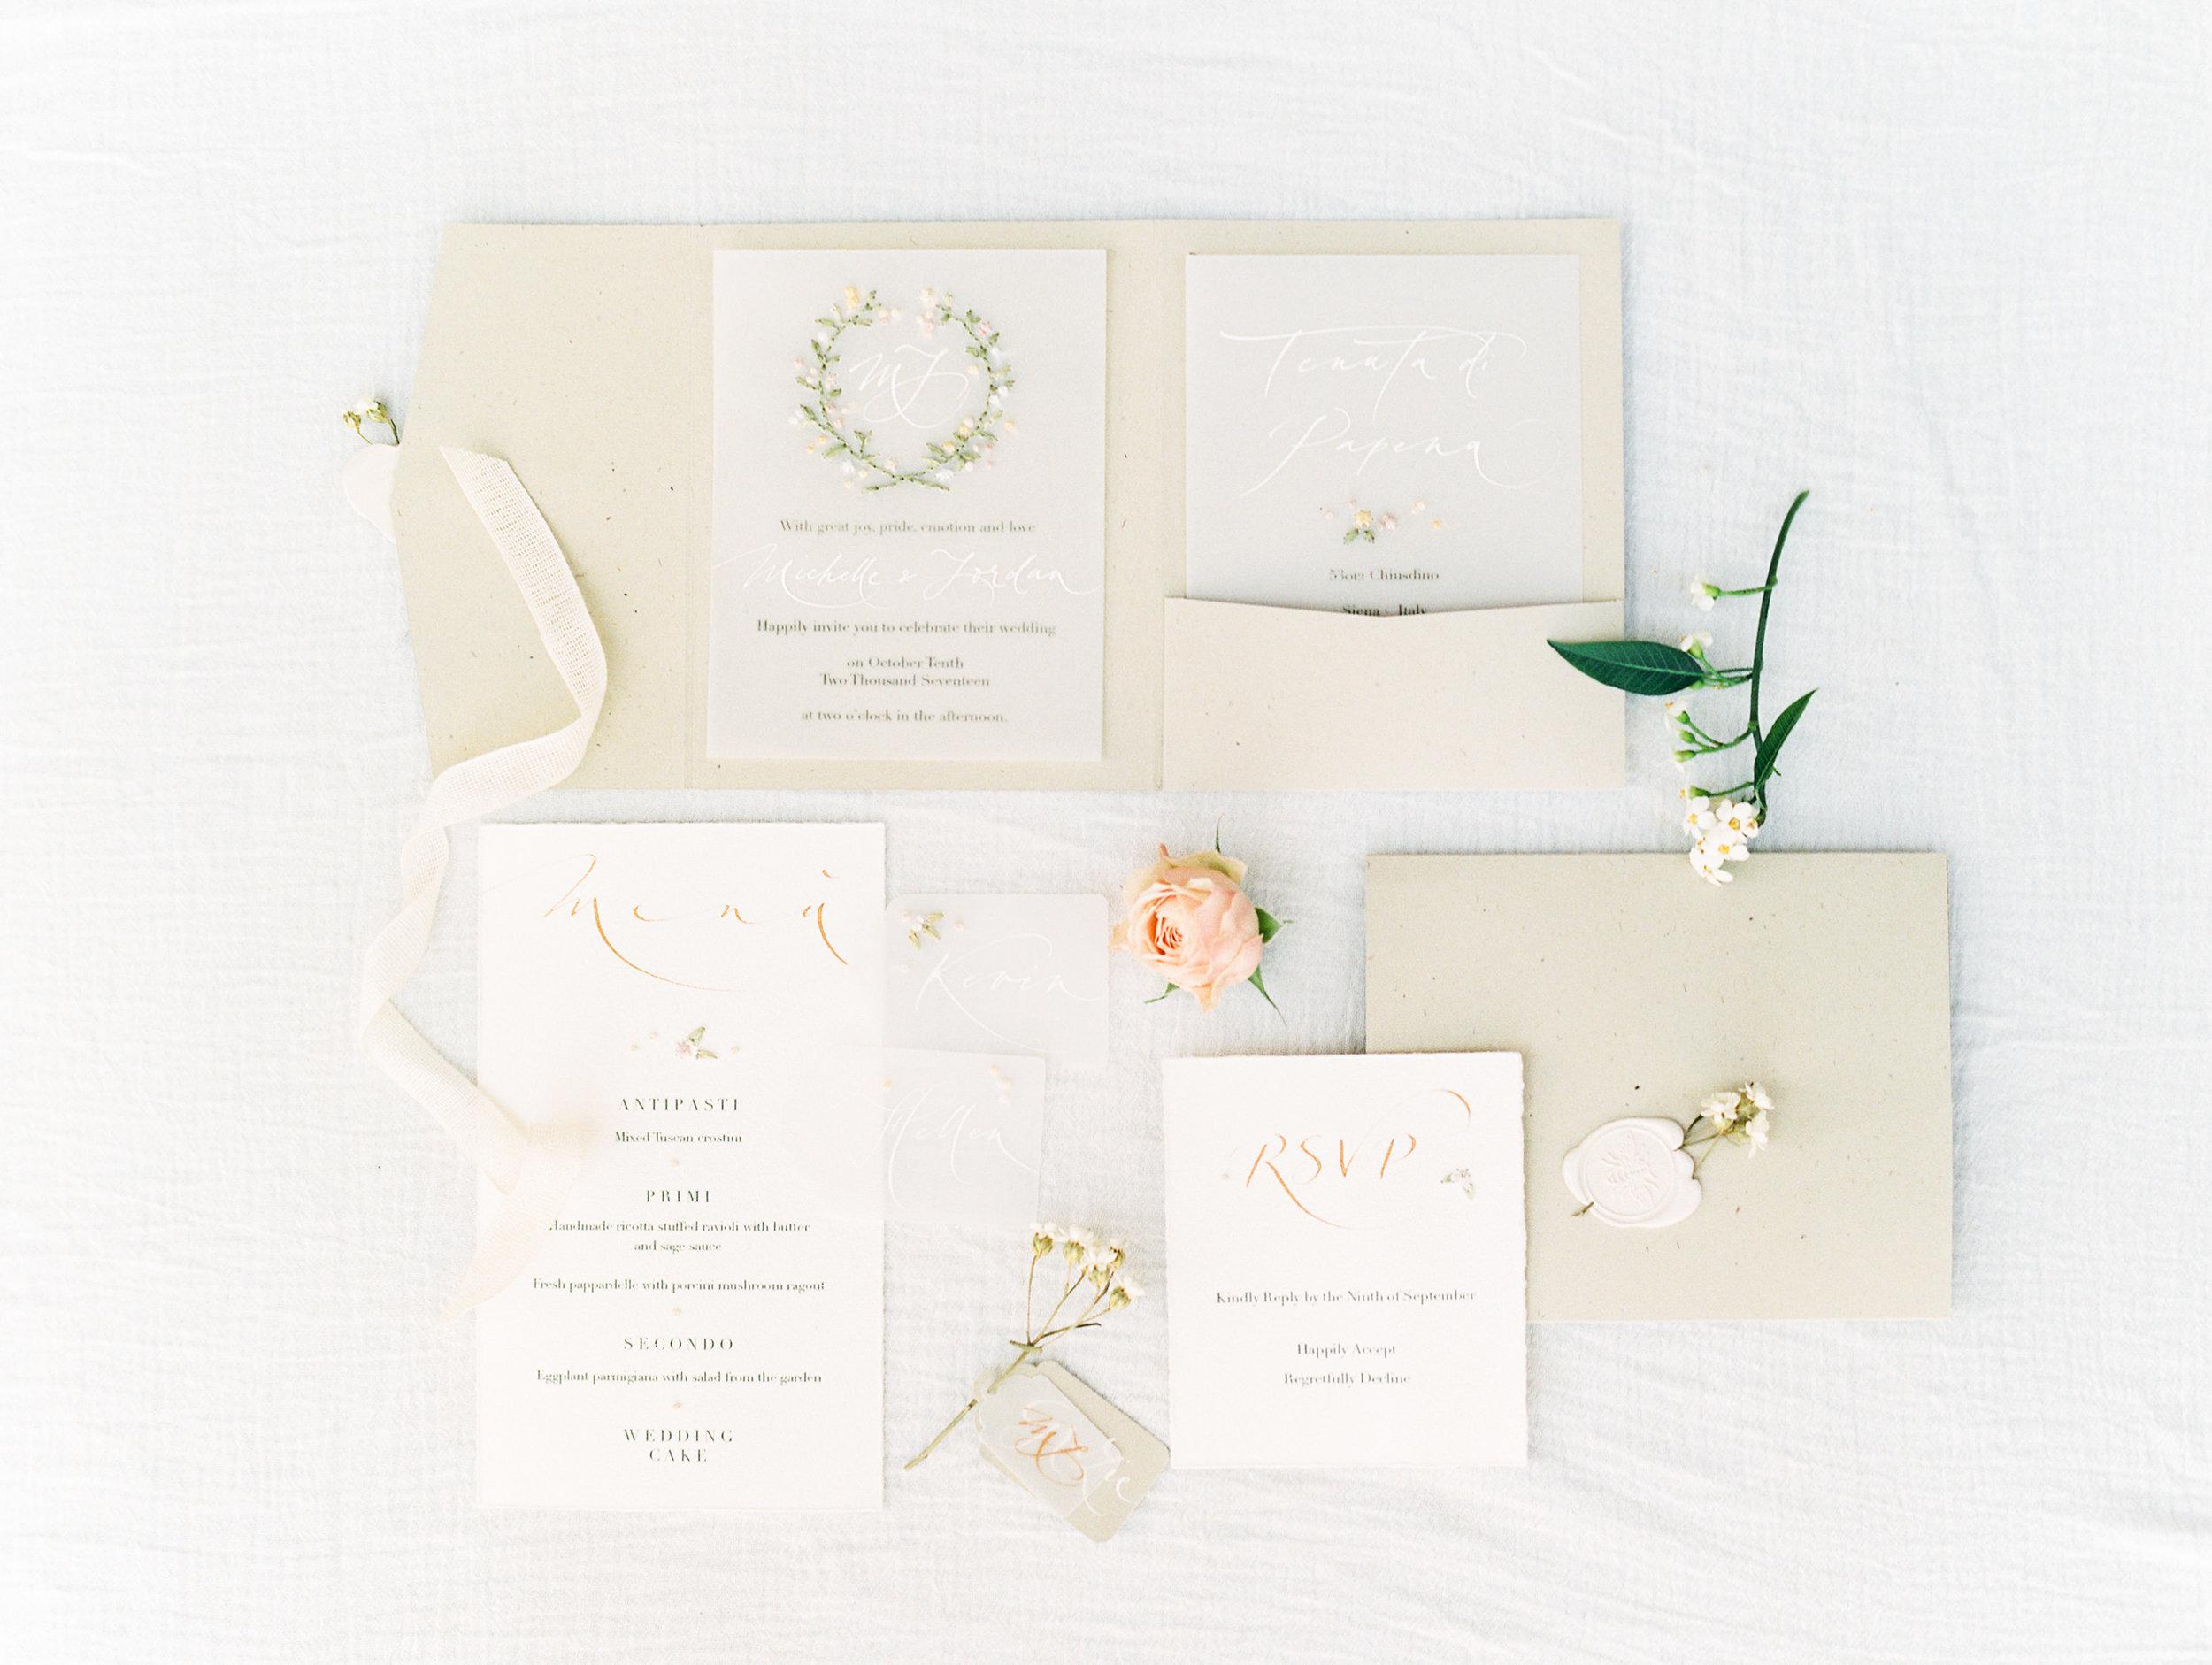 romantic-italy-wedding-in-tuscany-5.jpg